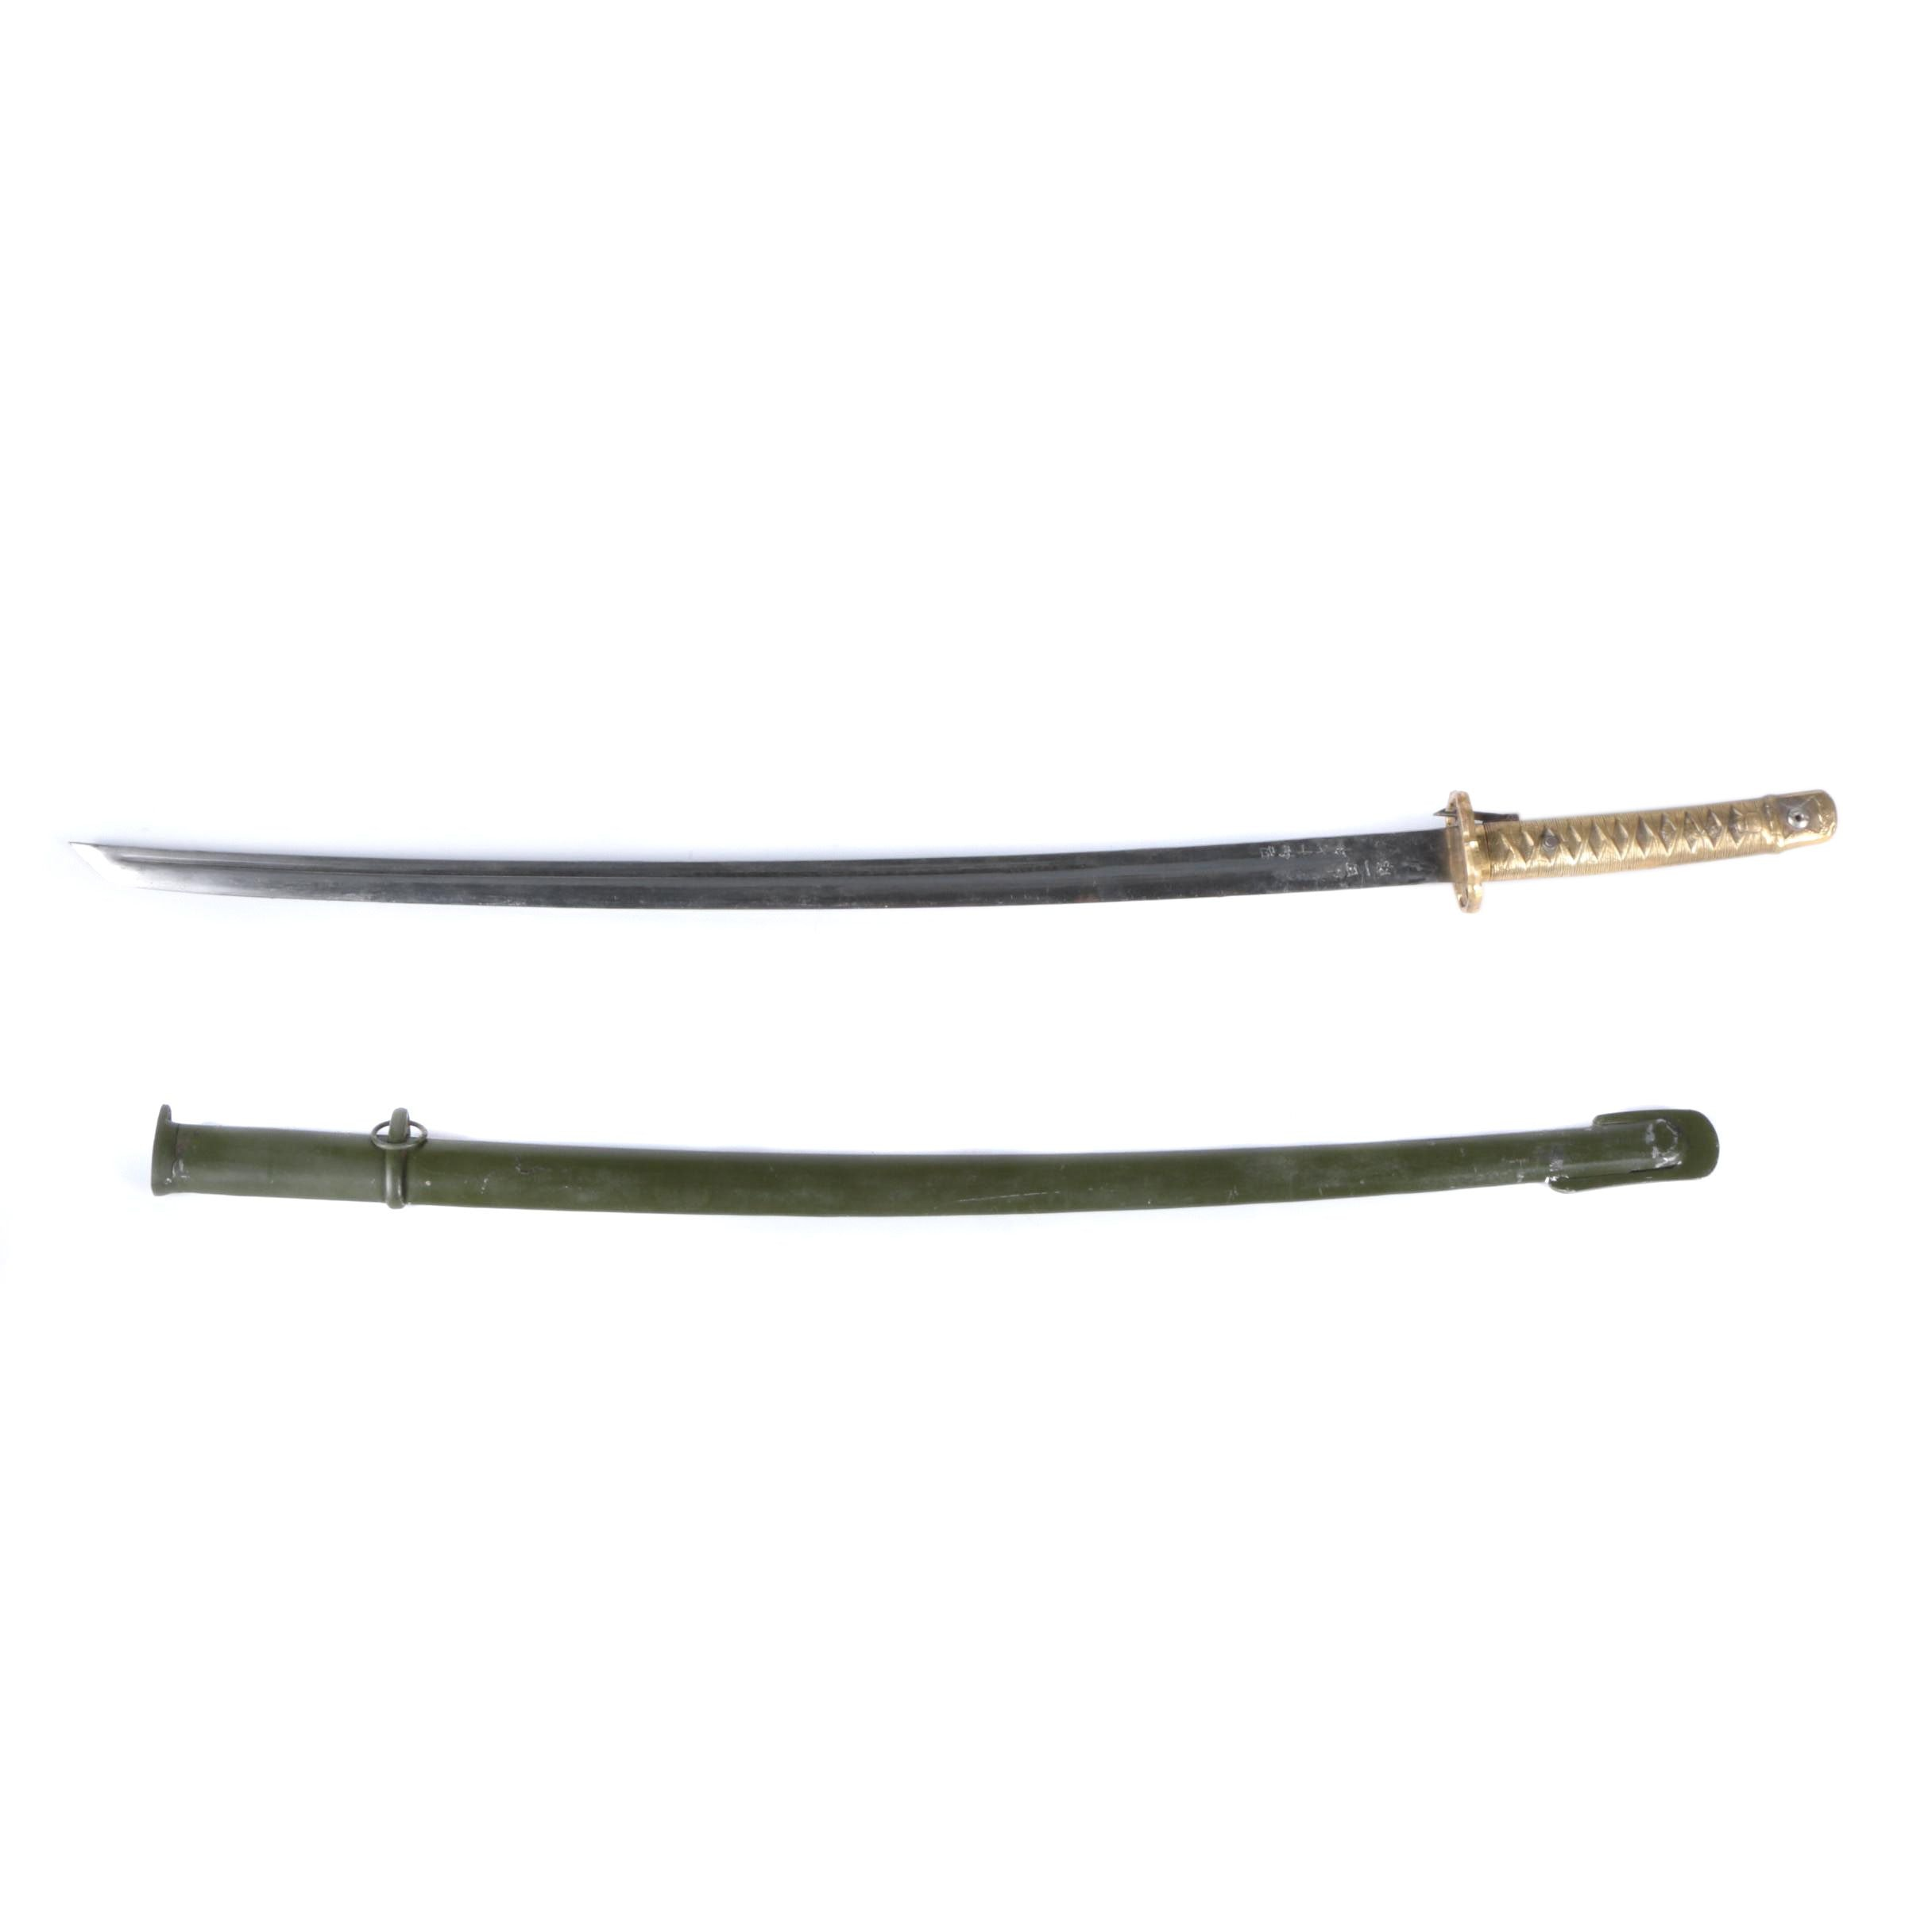 Replica of World War II Japanese Shin-Guntō NCO Sword with Metal Scabbard